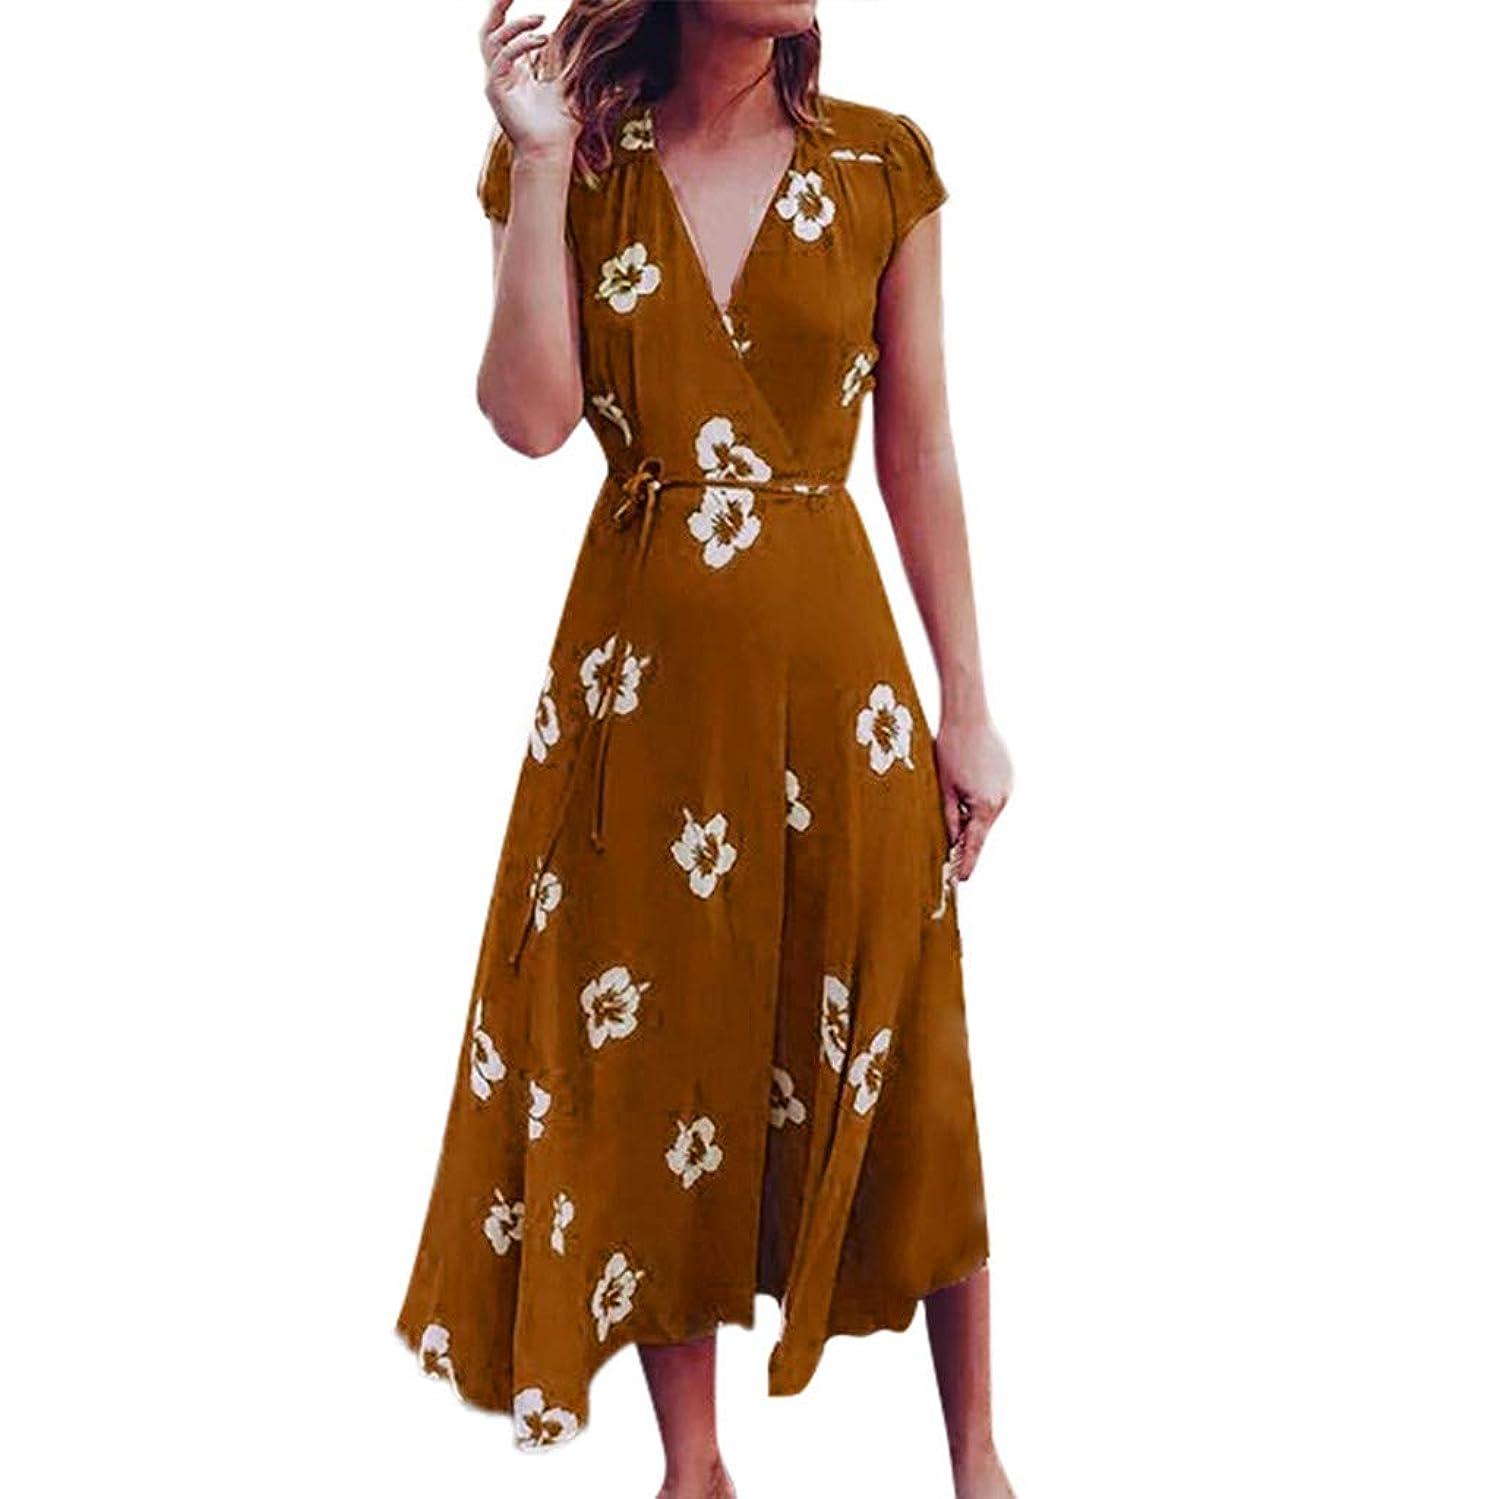 Emimarol Women's Short Sleeve Floral Print Dress Bandage Party Bohemian Long Maxi Dresses